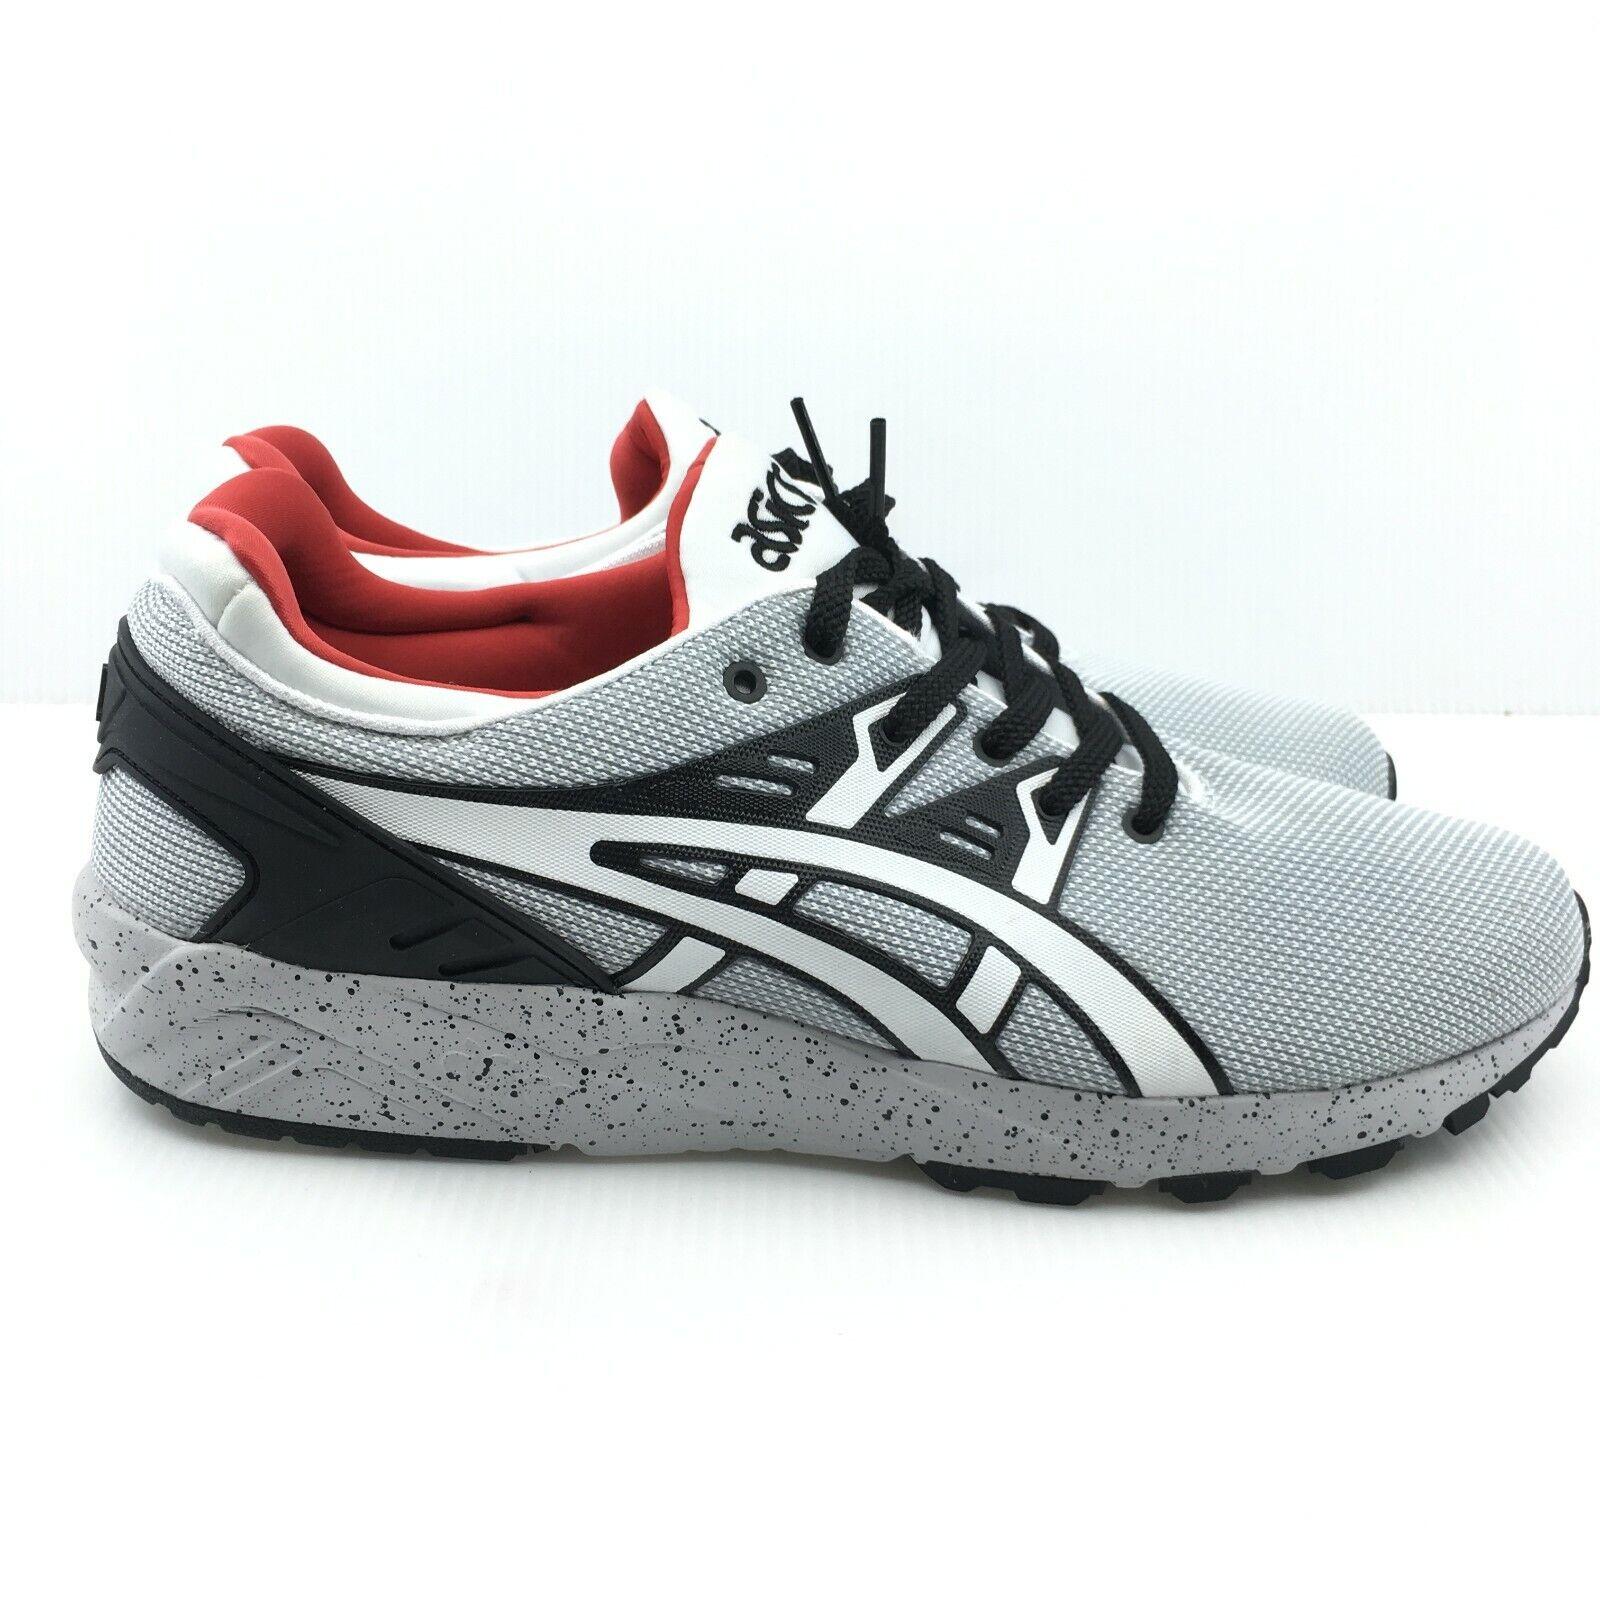 premium selection 467d4 2d687 Asics Tiger Men's Gel-Kayano Trainer Evo, White/White H6N0N-0101 Tiger  Running